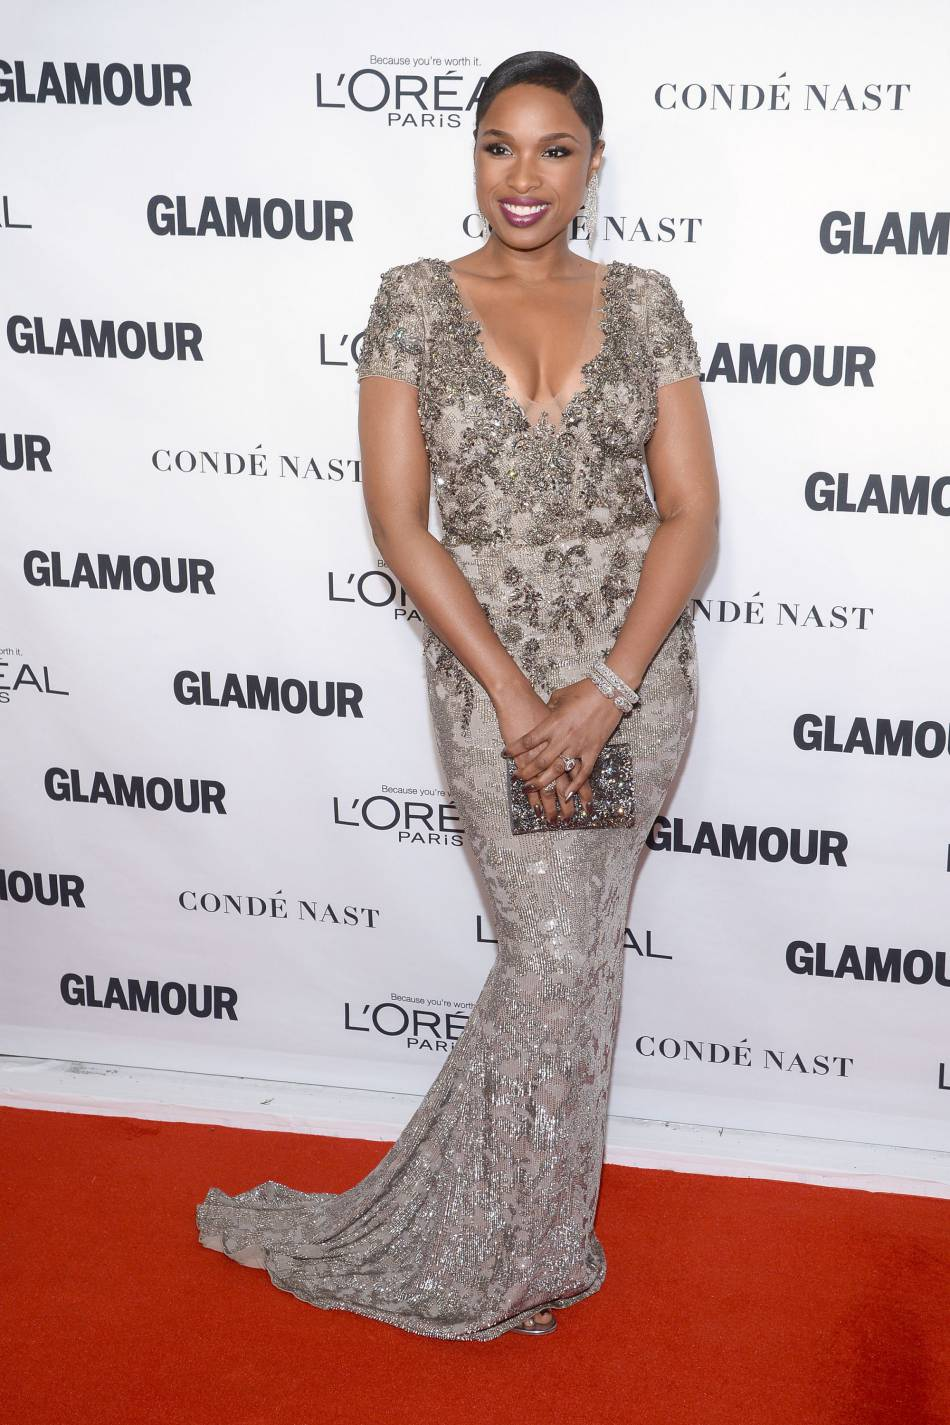 Jennifer Hudson aux Glamour Awards le 9 novembre 2015 à New York.